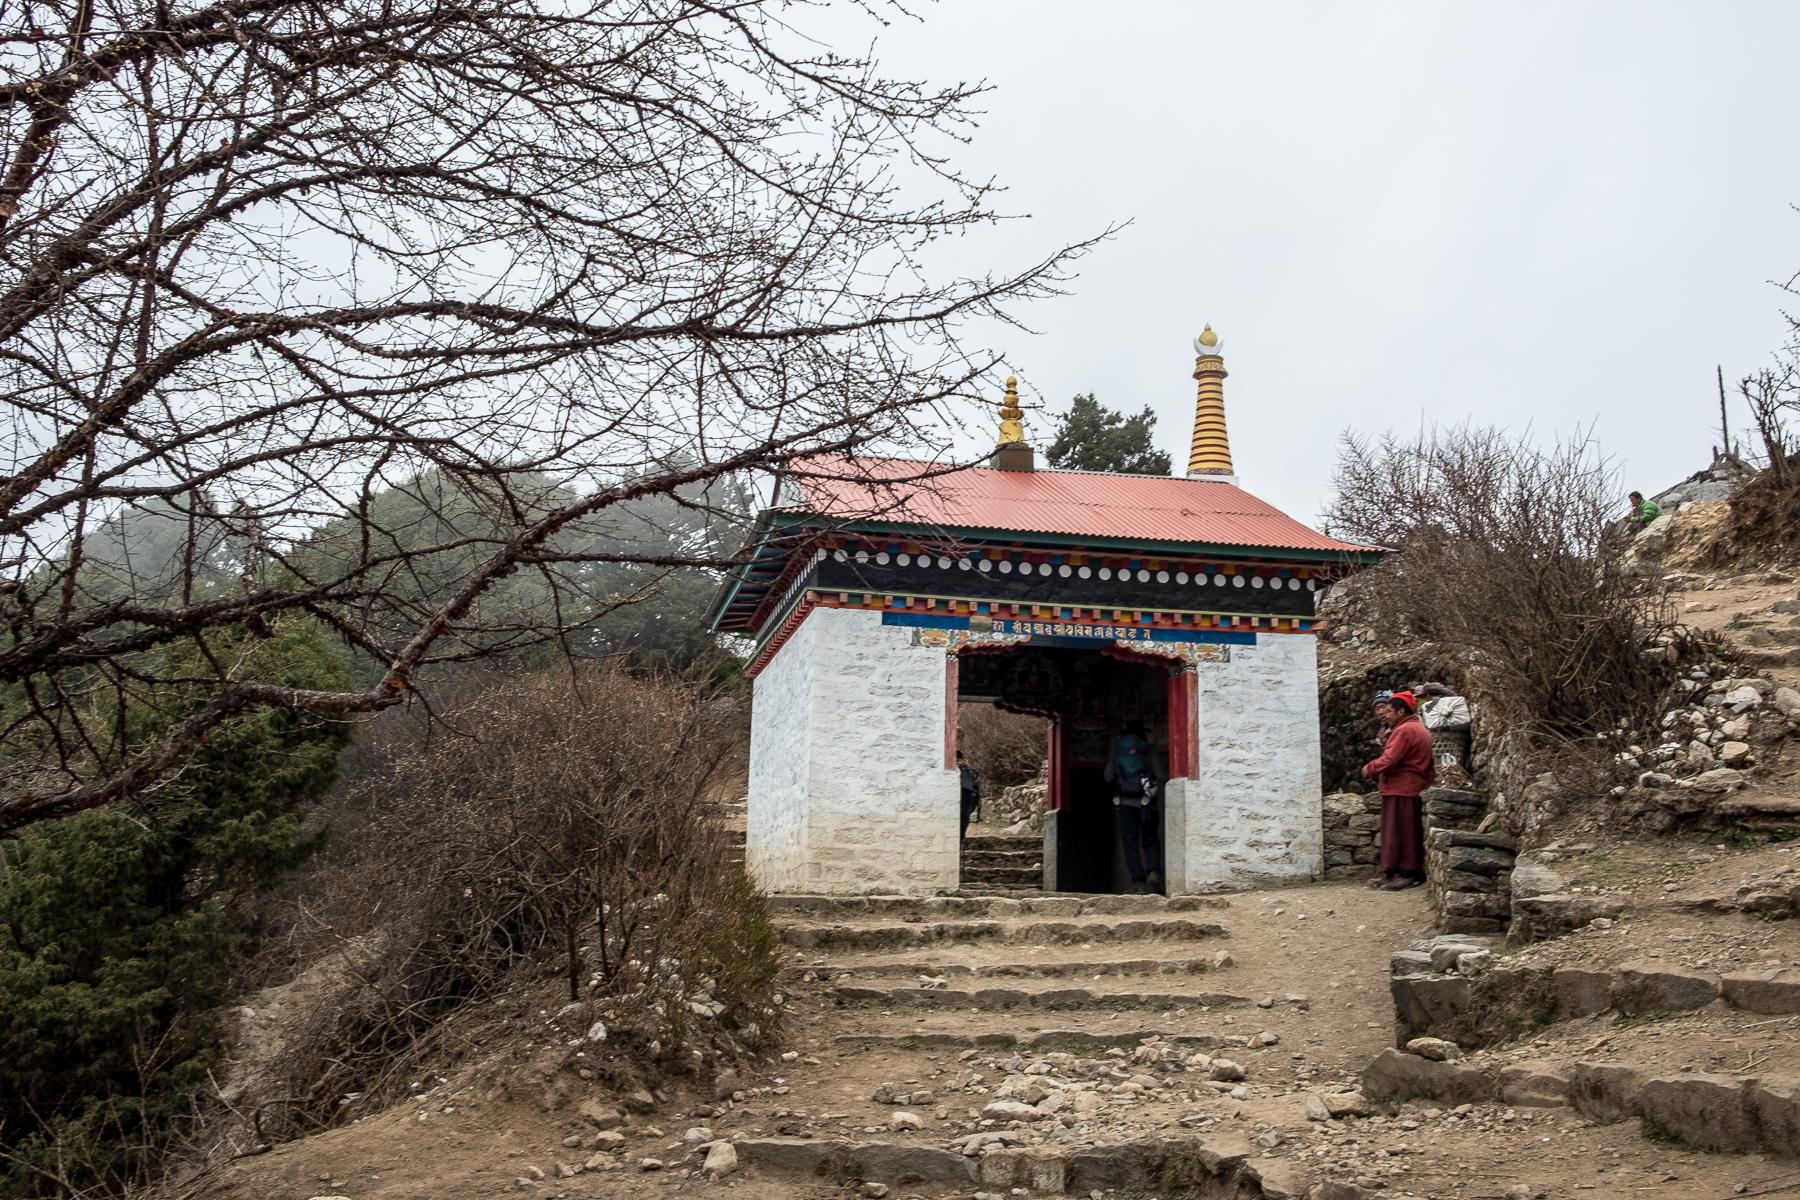 The Kani Gate outside Tengboche, Nepal.